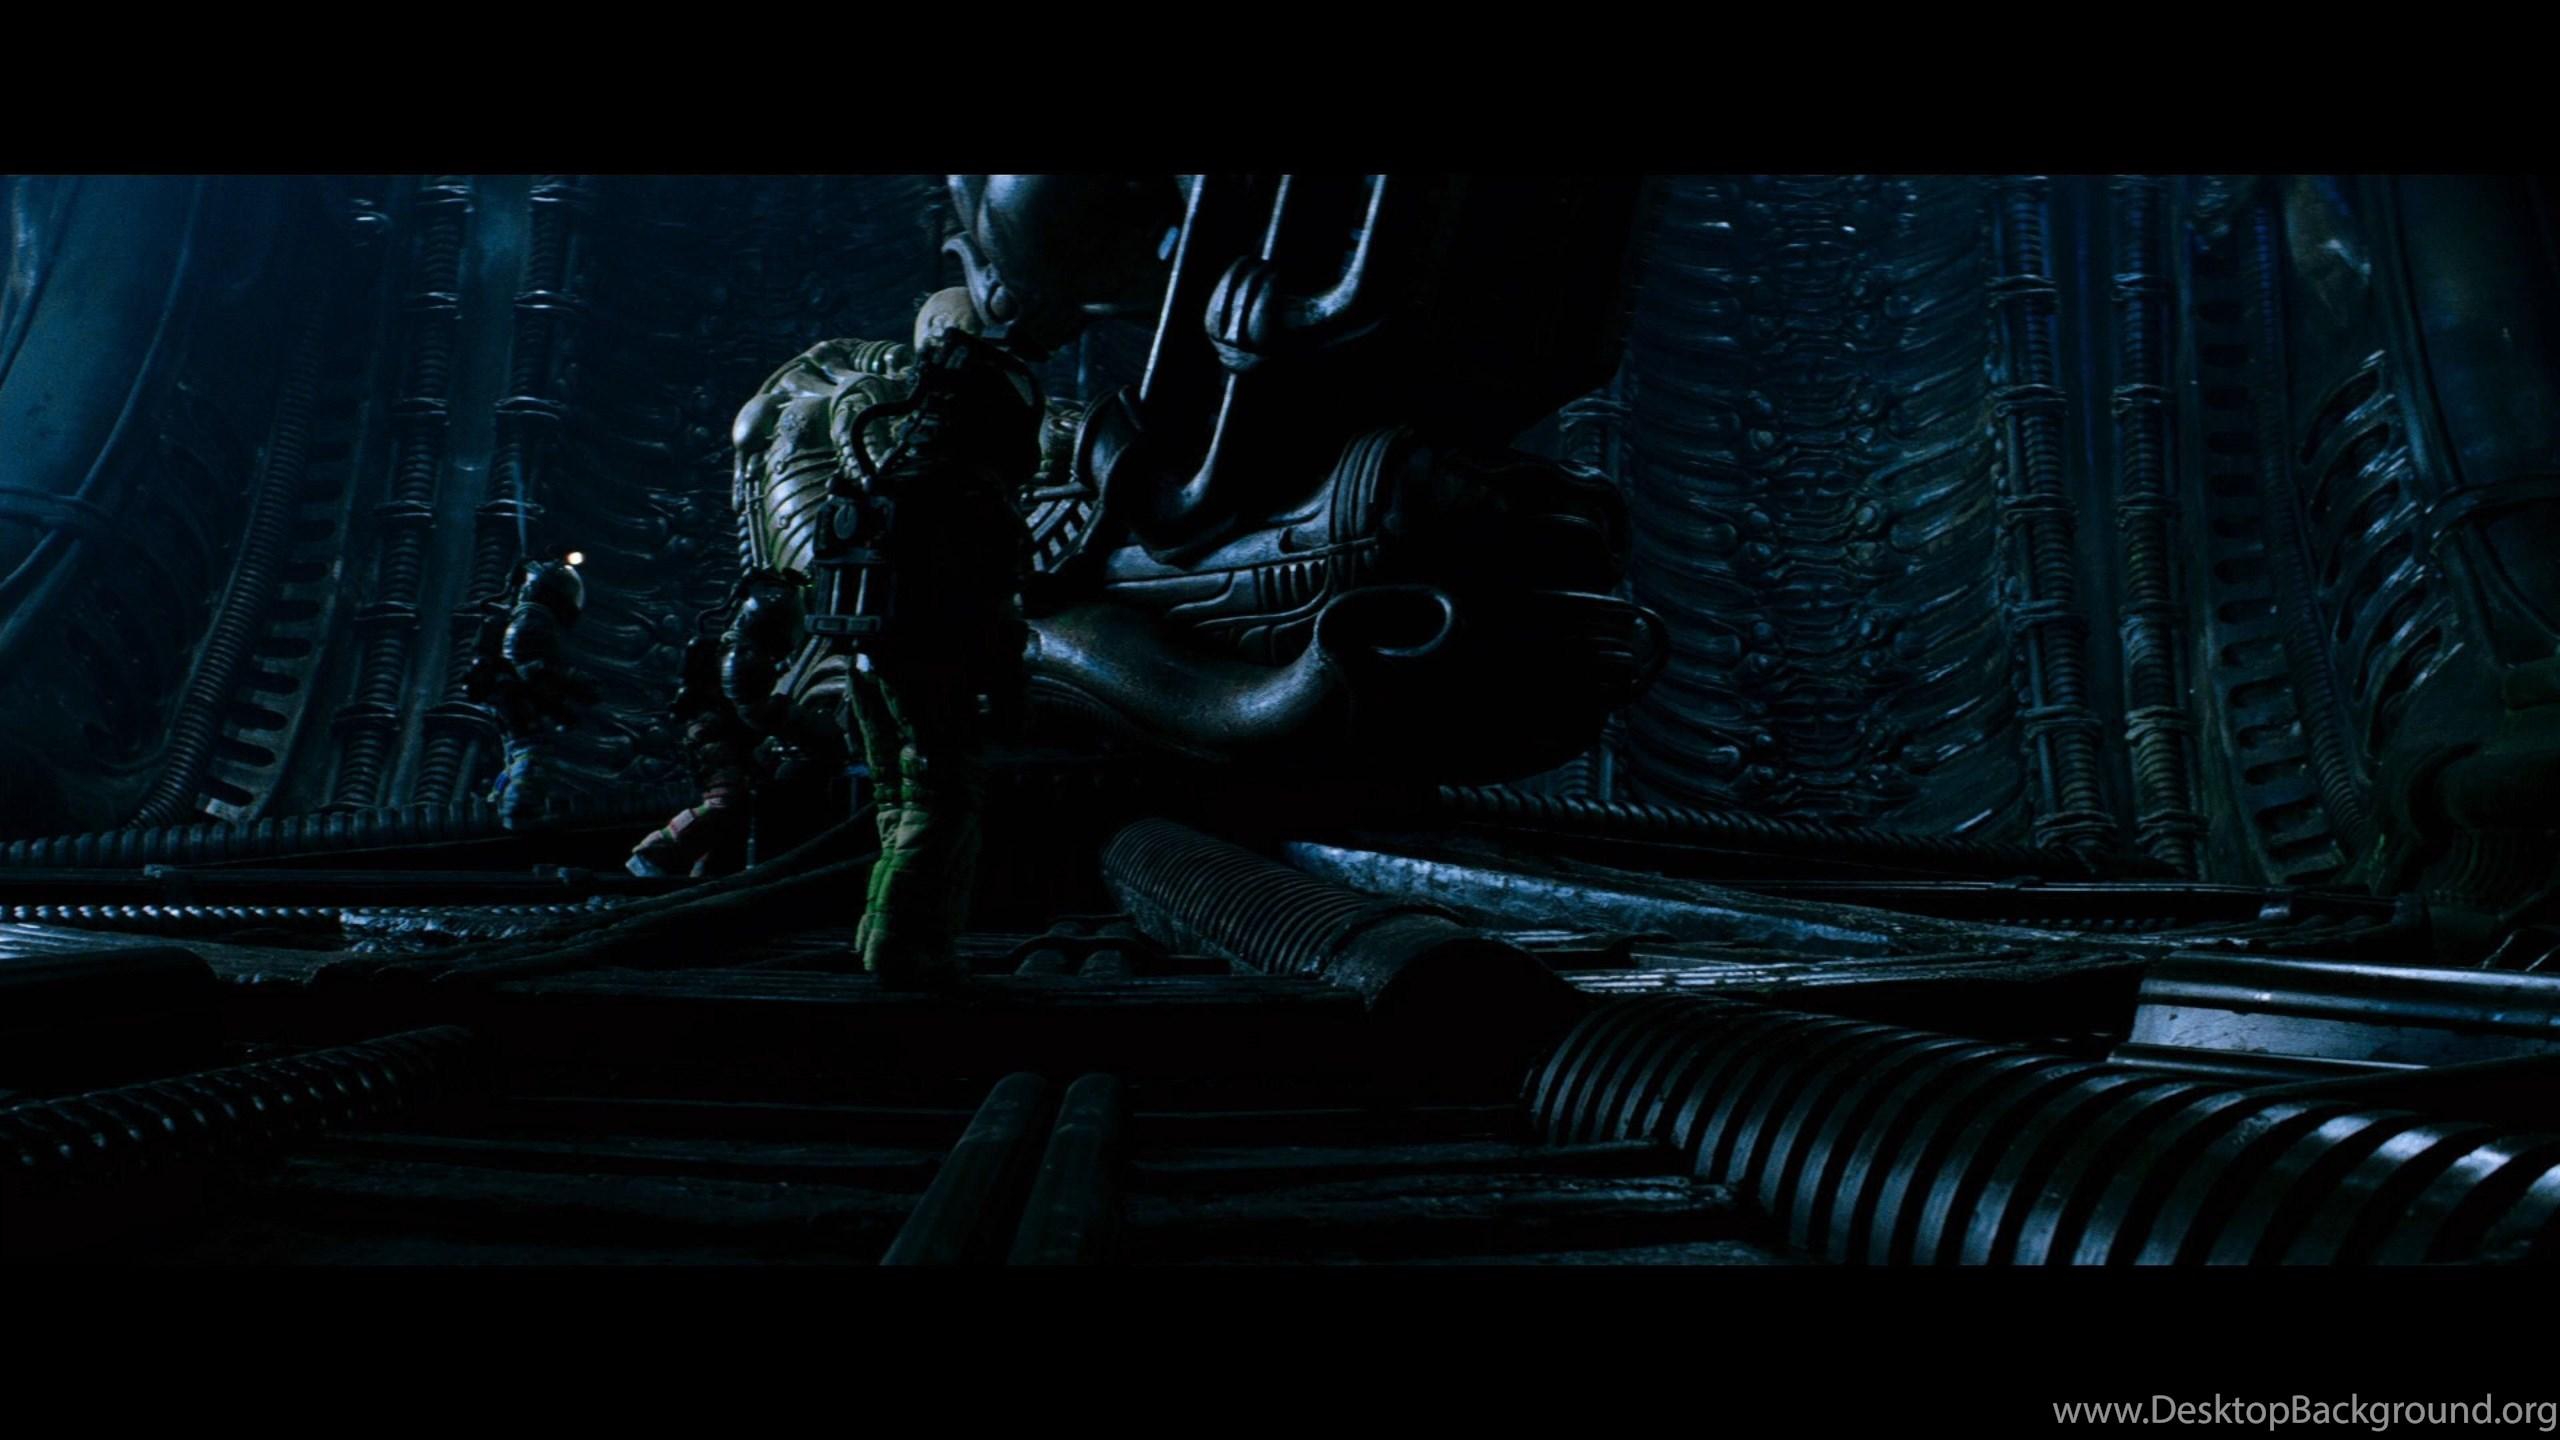 Chess Aliens Vs Predator Movie Artwork Desktop Background